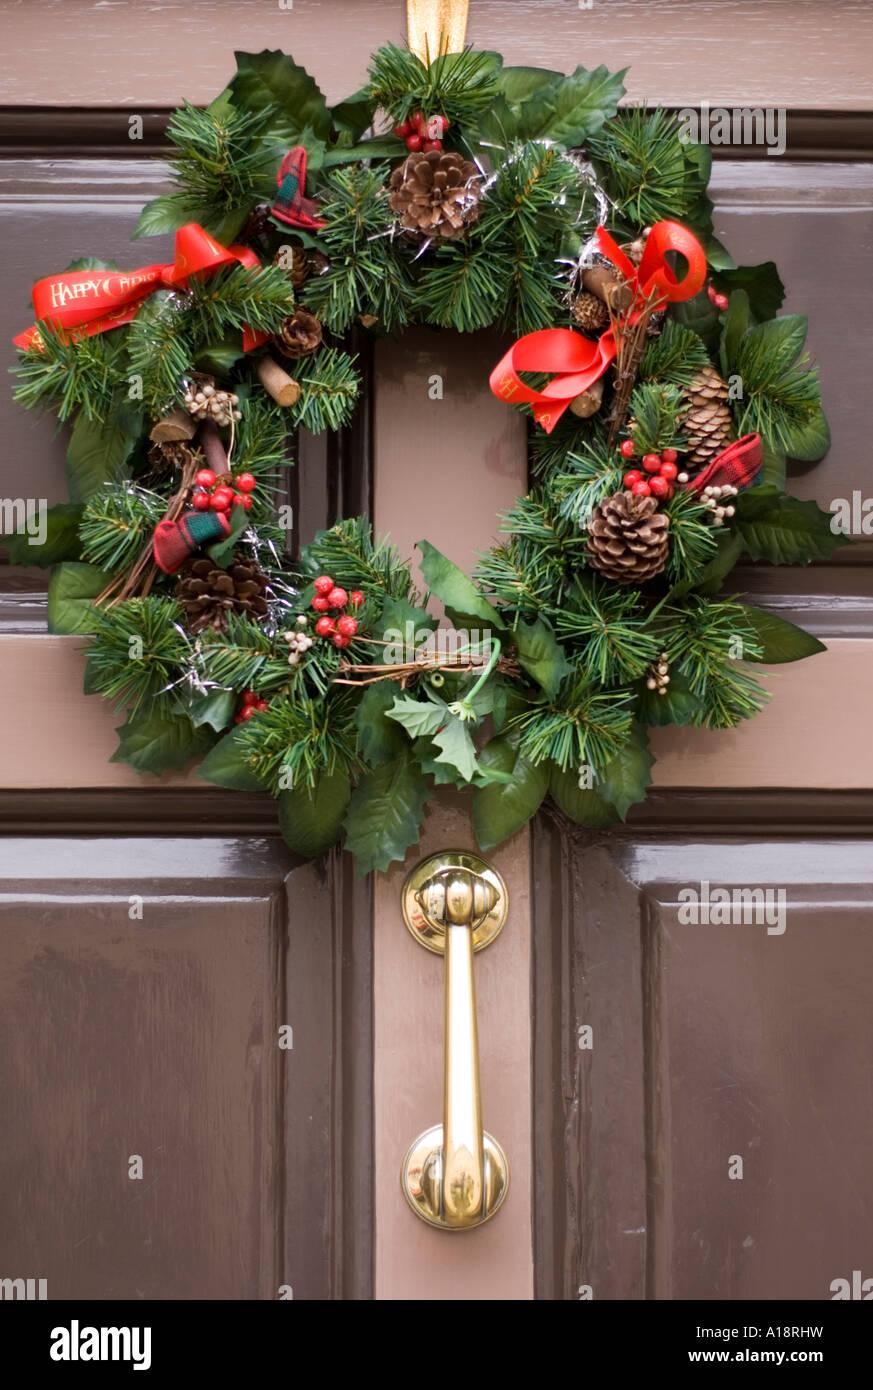 England Uk Christmas Wreath On A Front Door Stock Photo 10181124